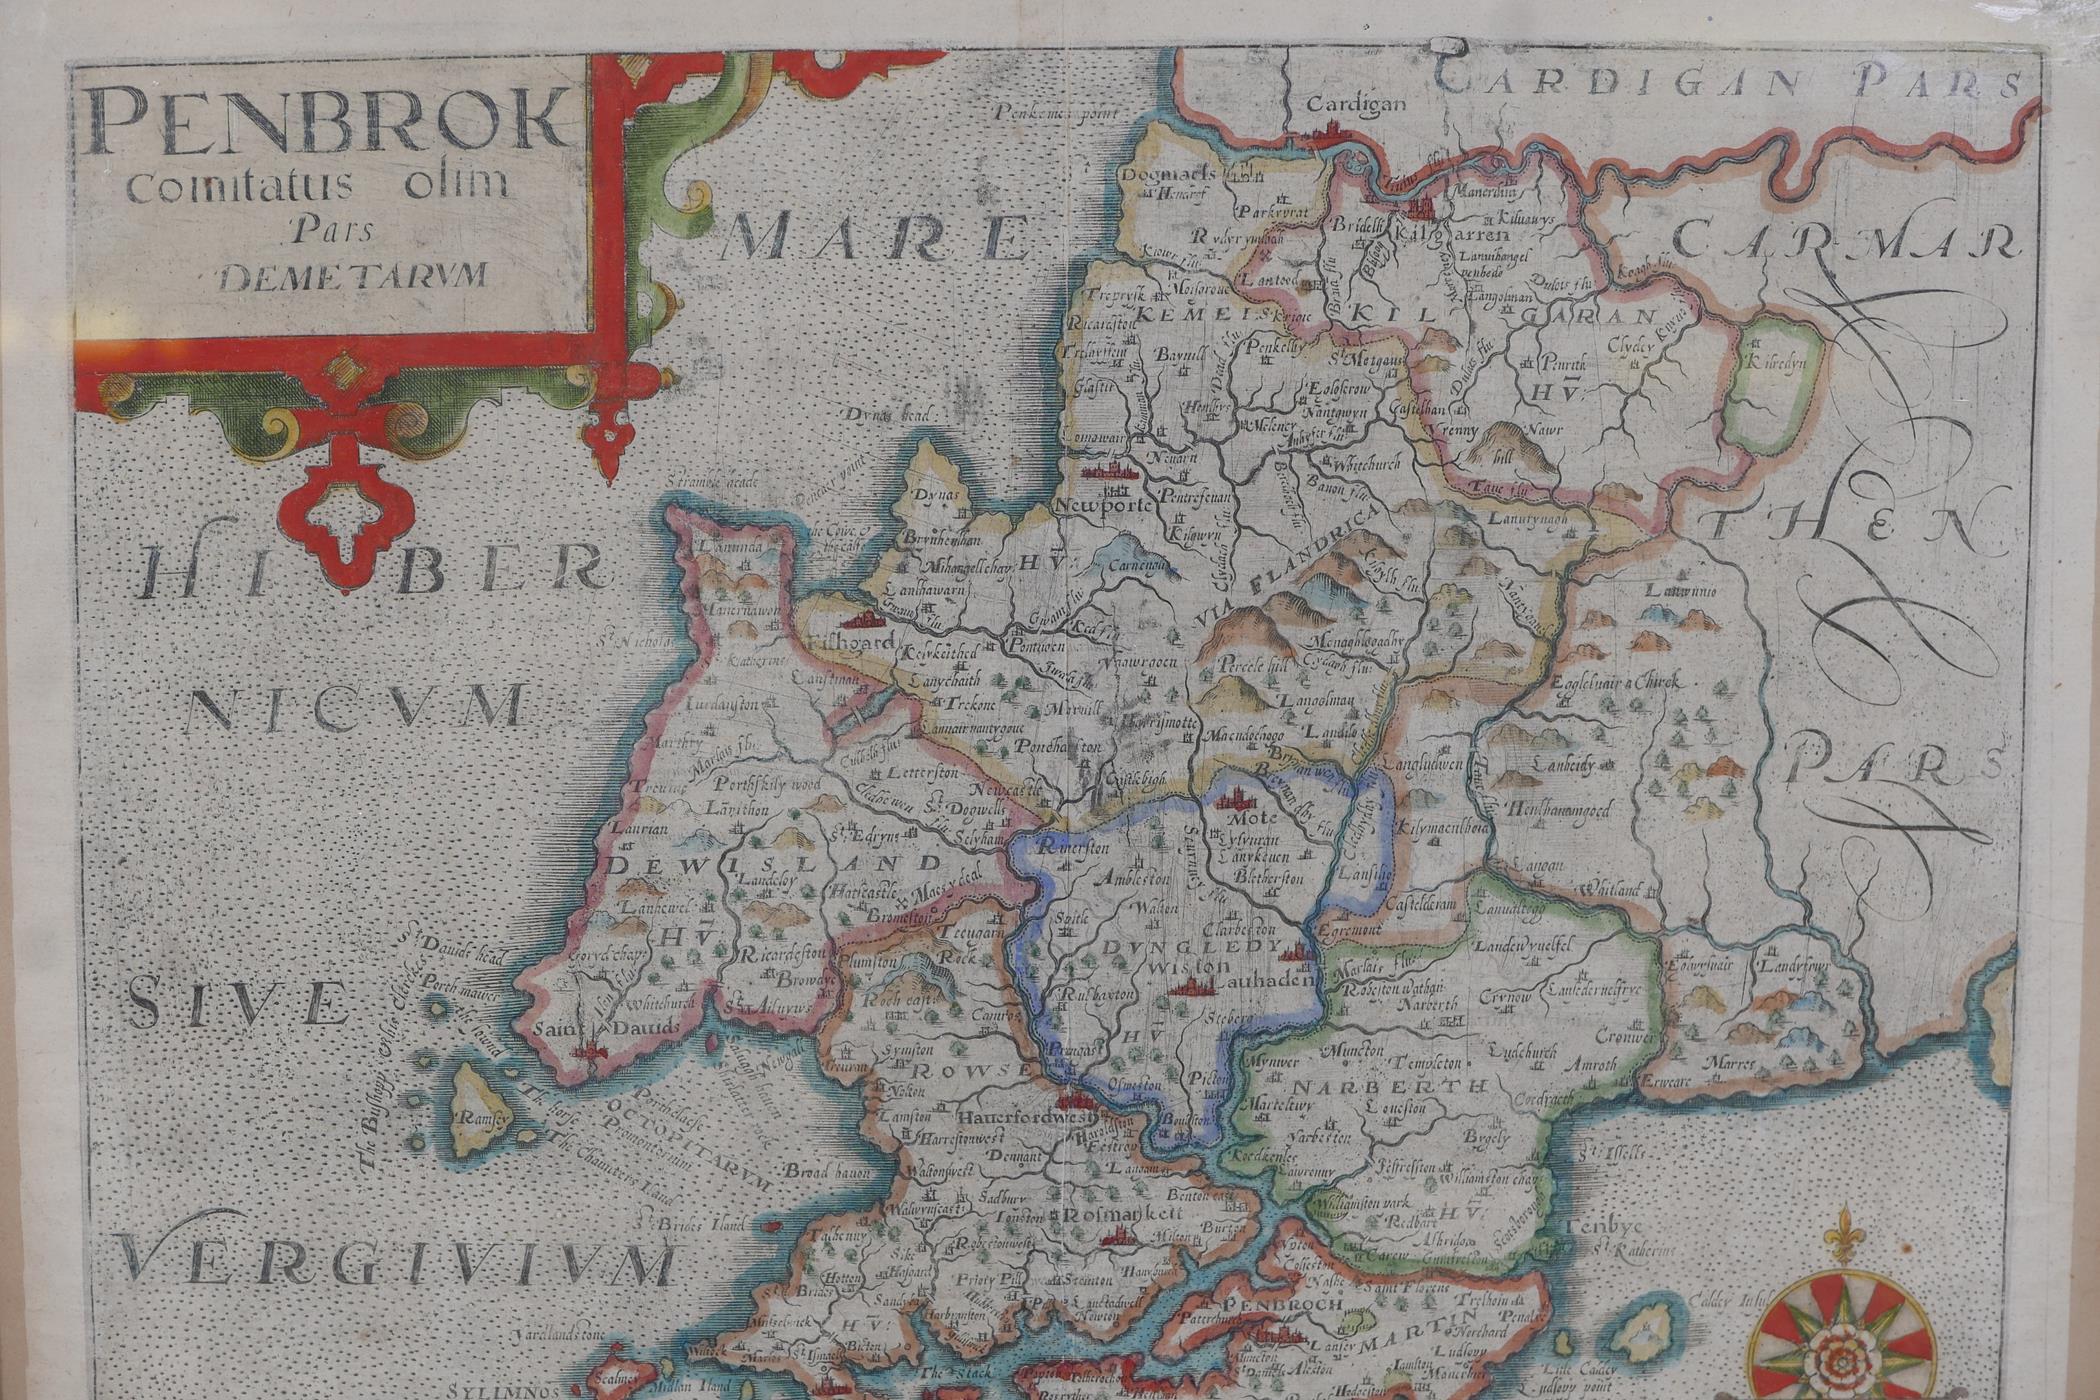 Wilhemus Kip, early C17th map of Pembroke (Pembrok) after surveys by George Owen, later hand